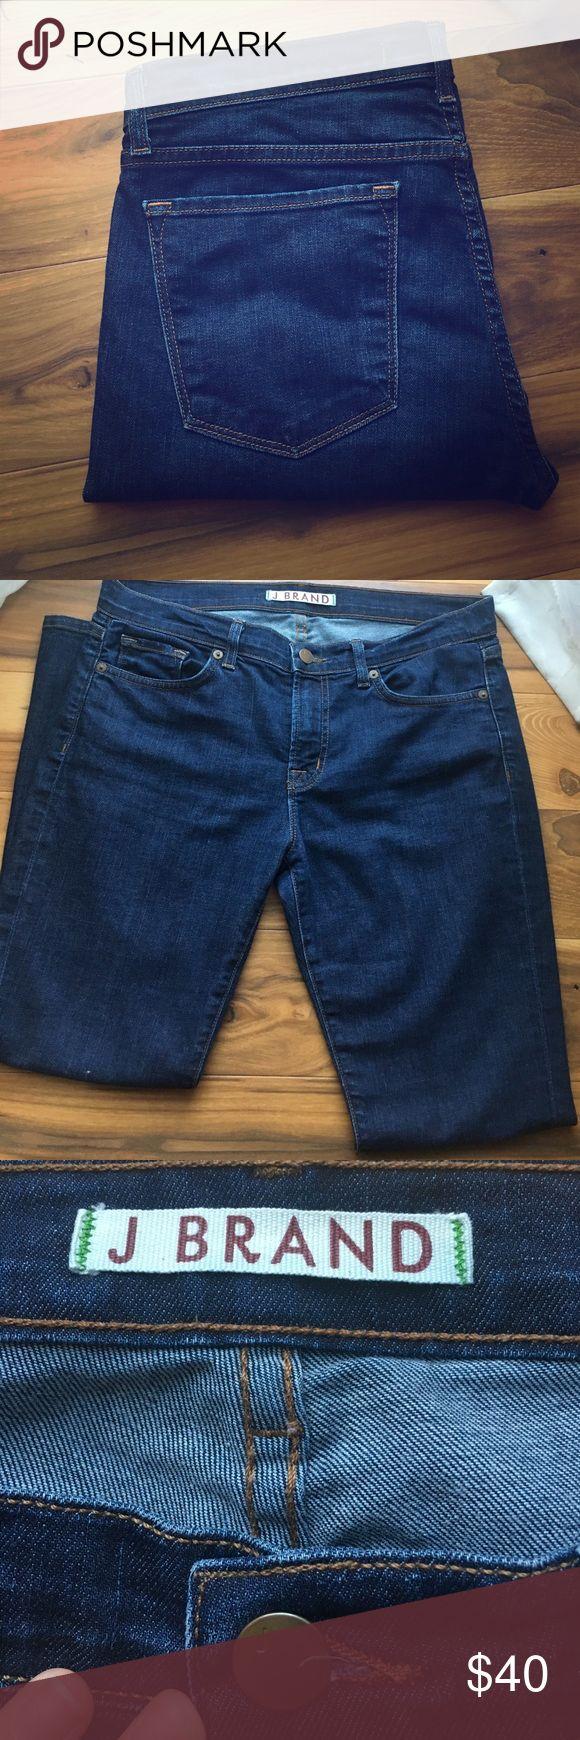 OFFERS! J Brand Jeans 👖💕💎 J brand. GiGi style. Size 28 J Brand Jeans Boot Cut